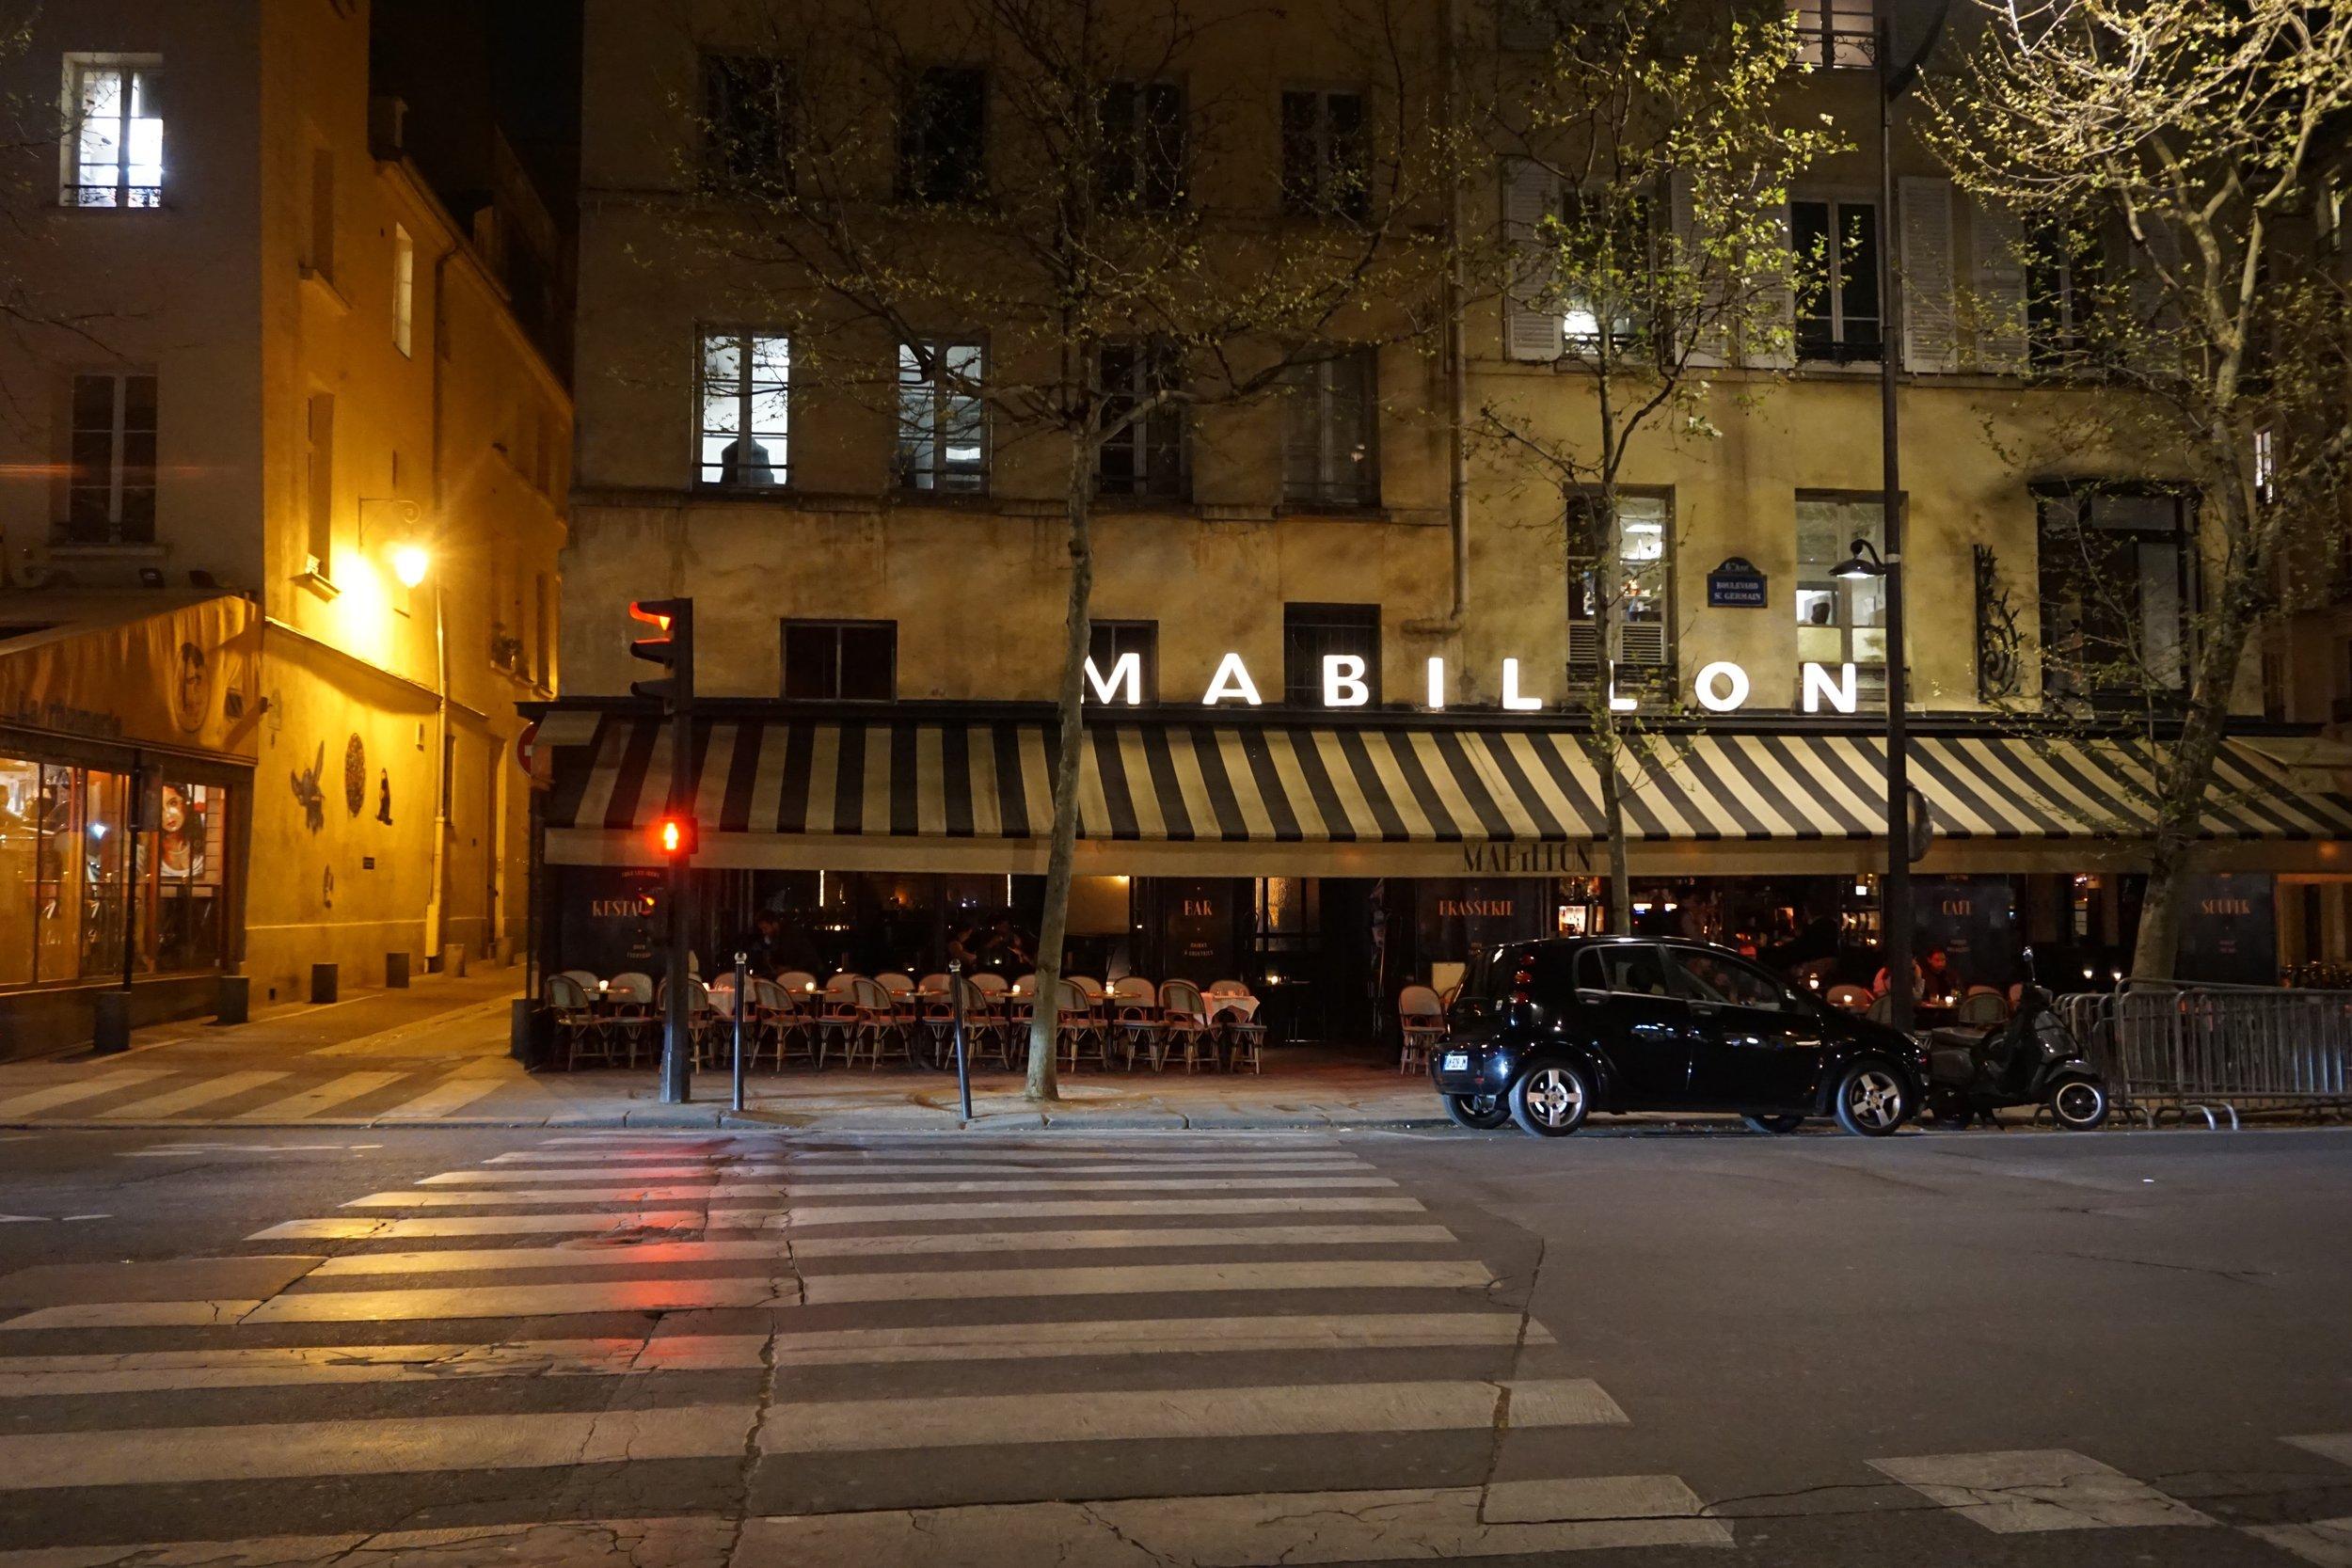 A wonderful cafe in the 6th Saint Germain neighborhood.